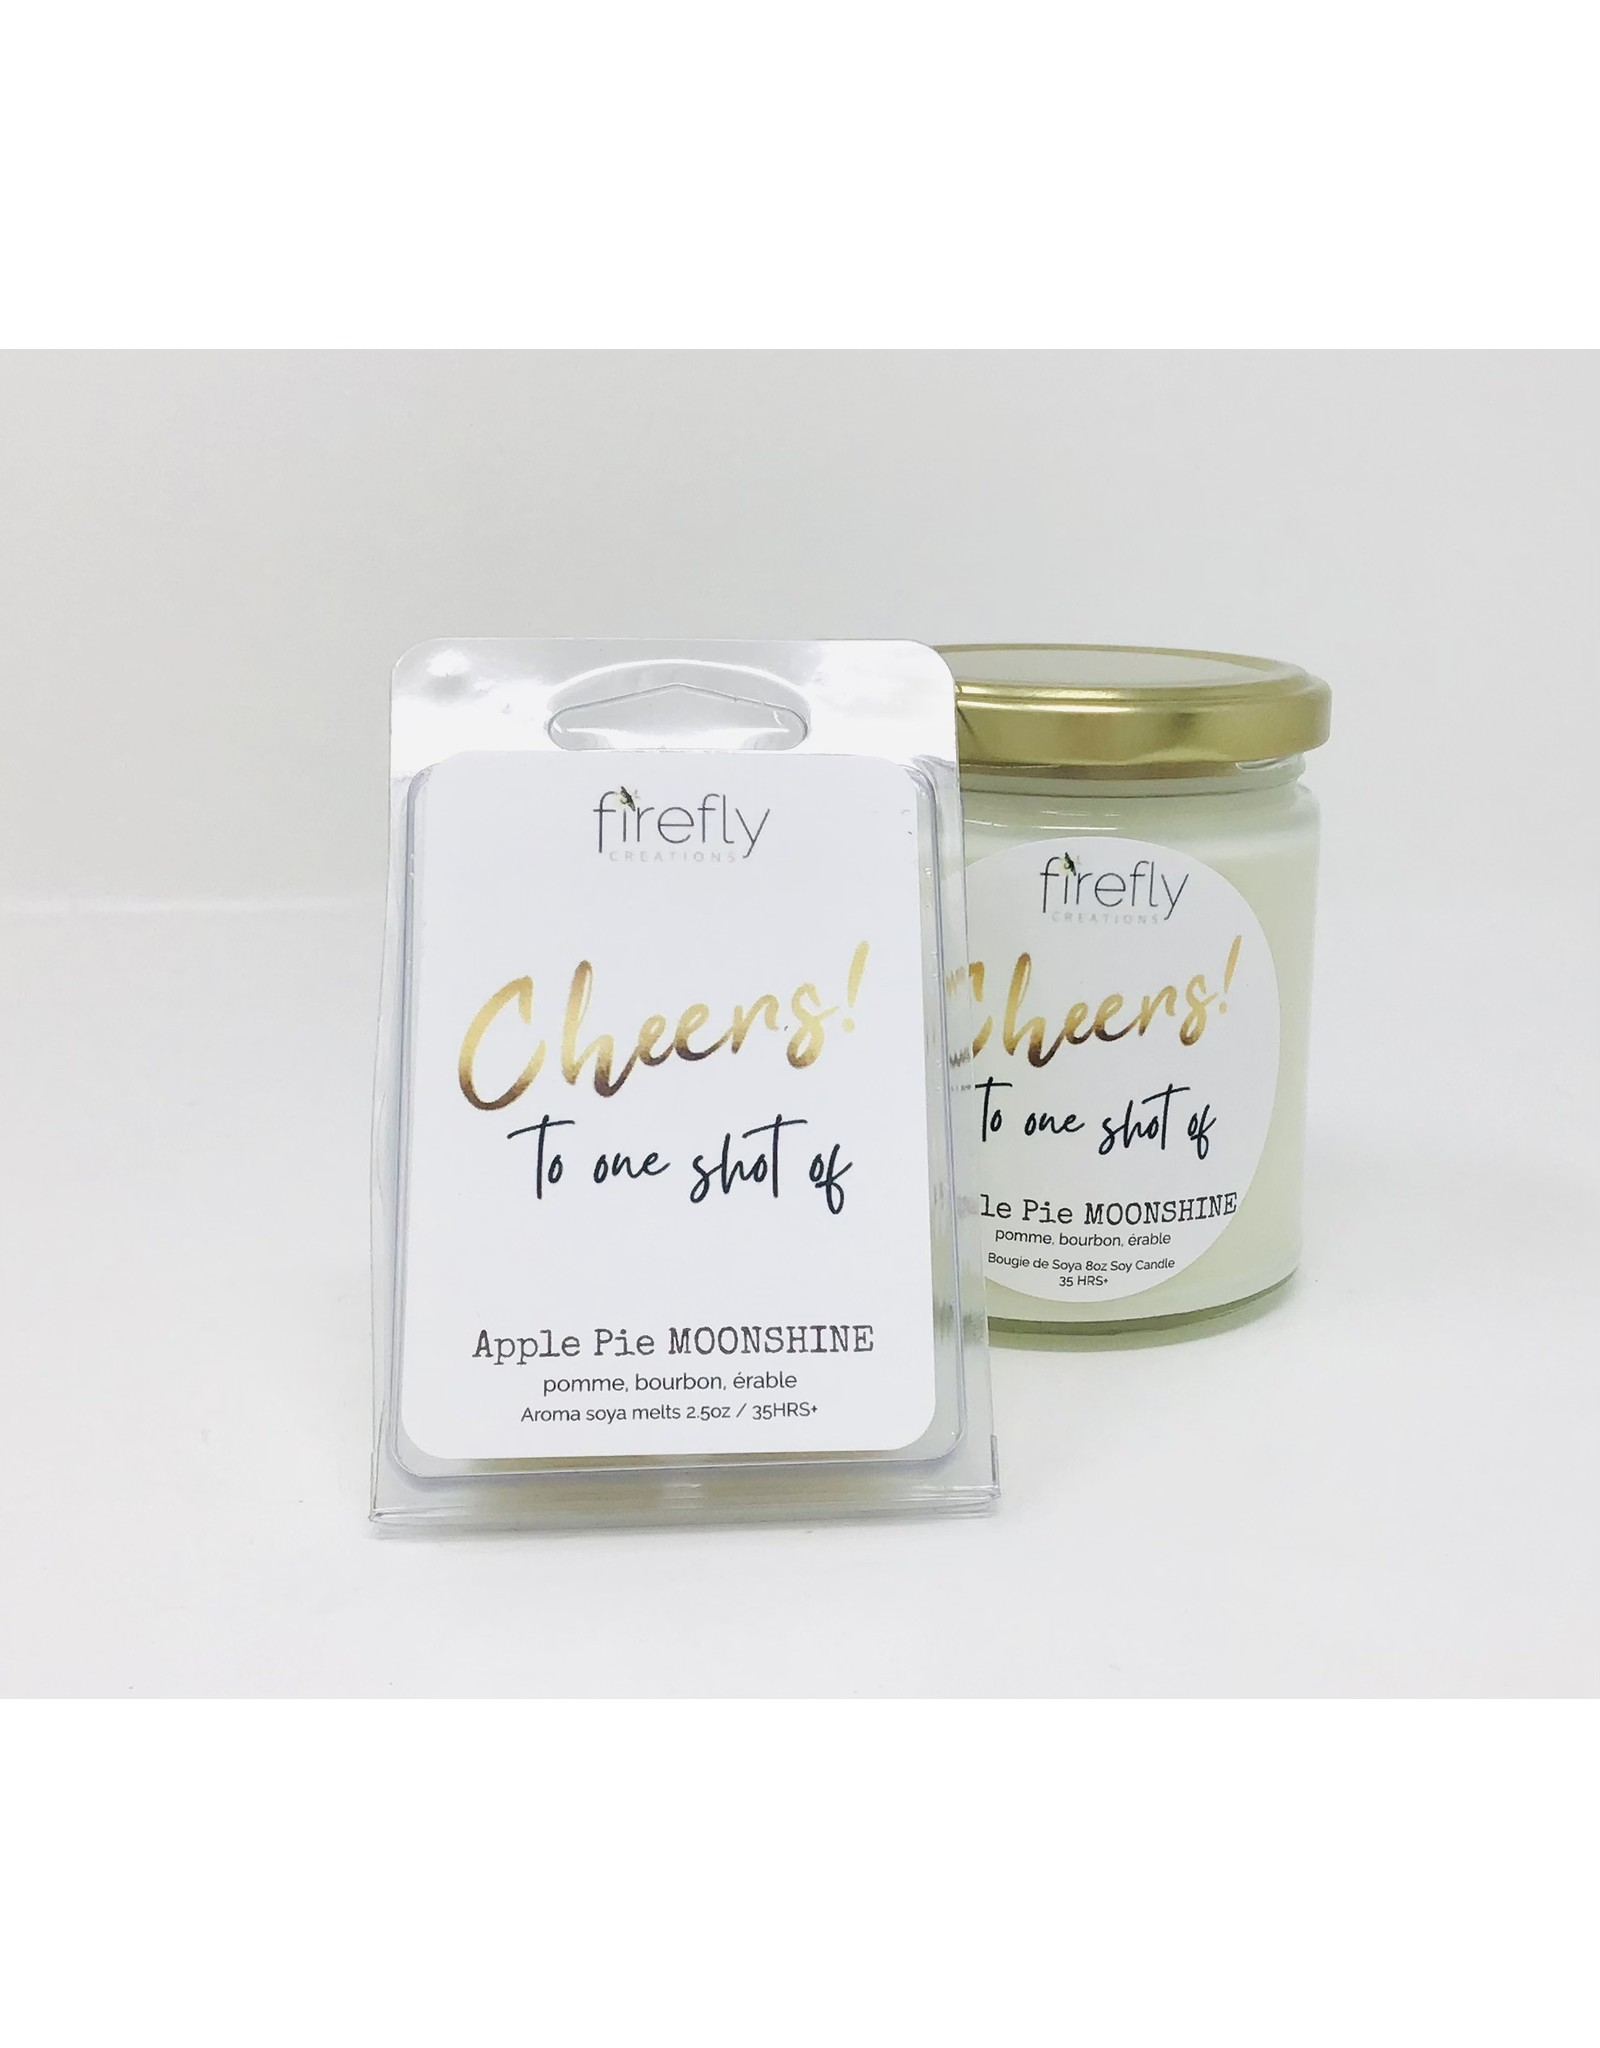 Firefly Creations, Apple Pie Moonshine Wax Melts 2.5oz